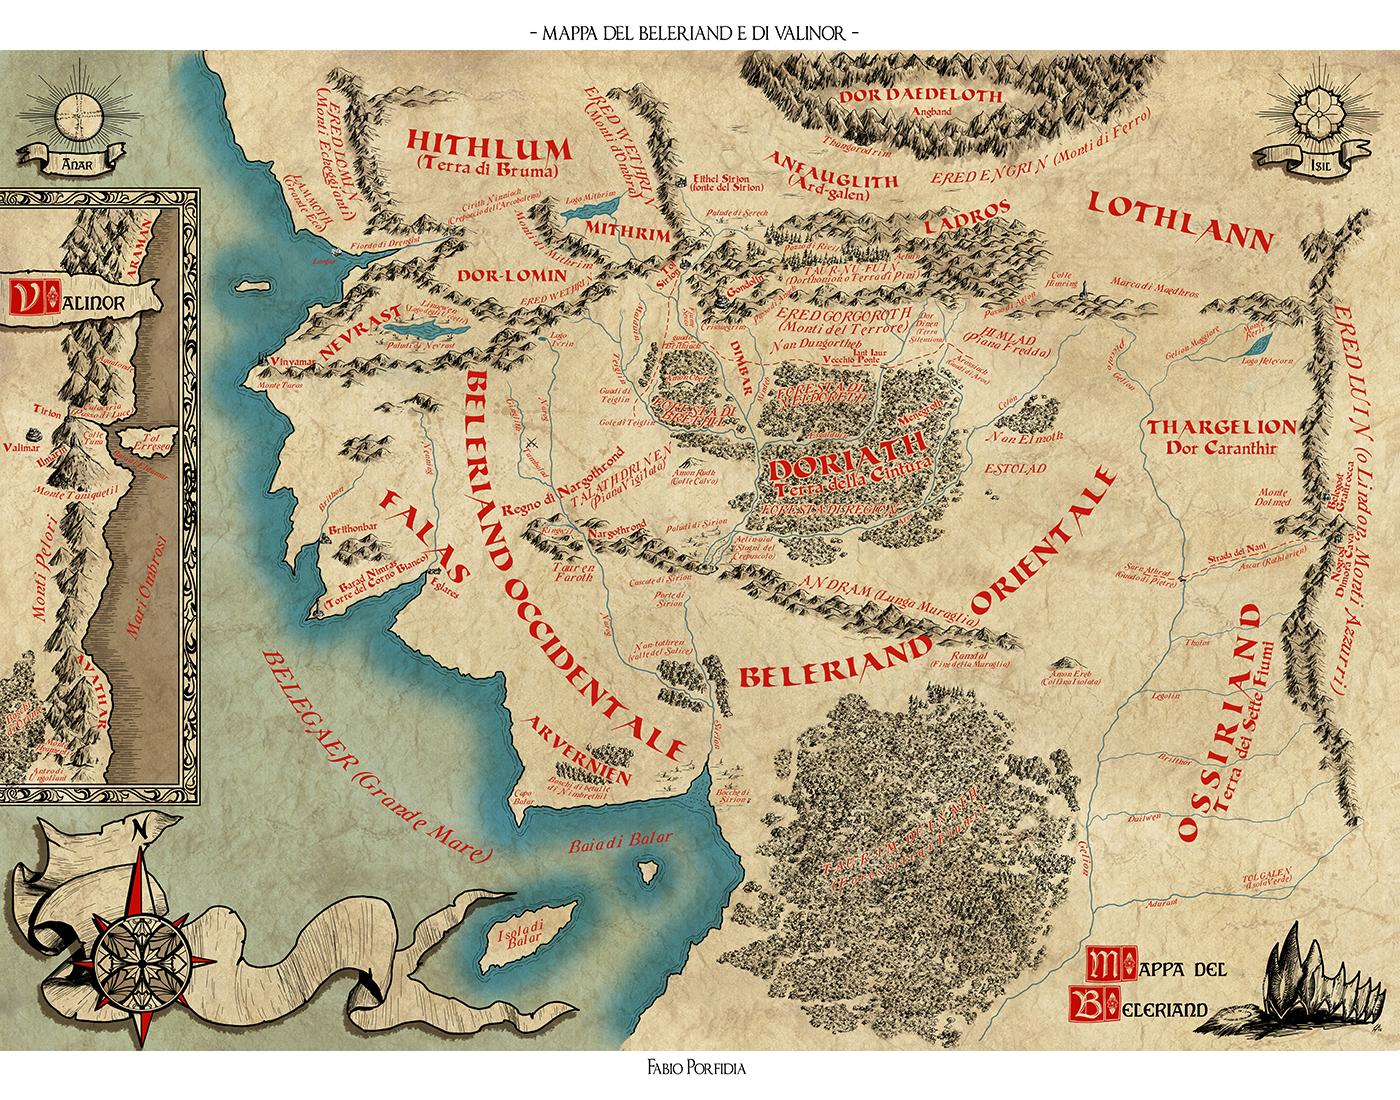 Beleriand e Valinor